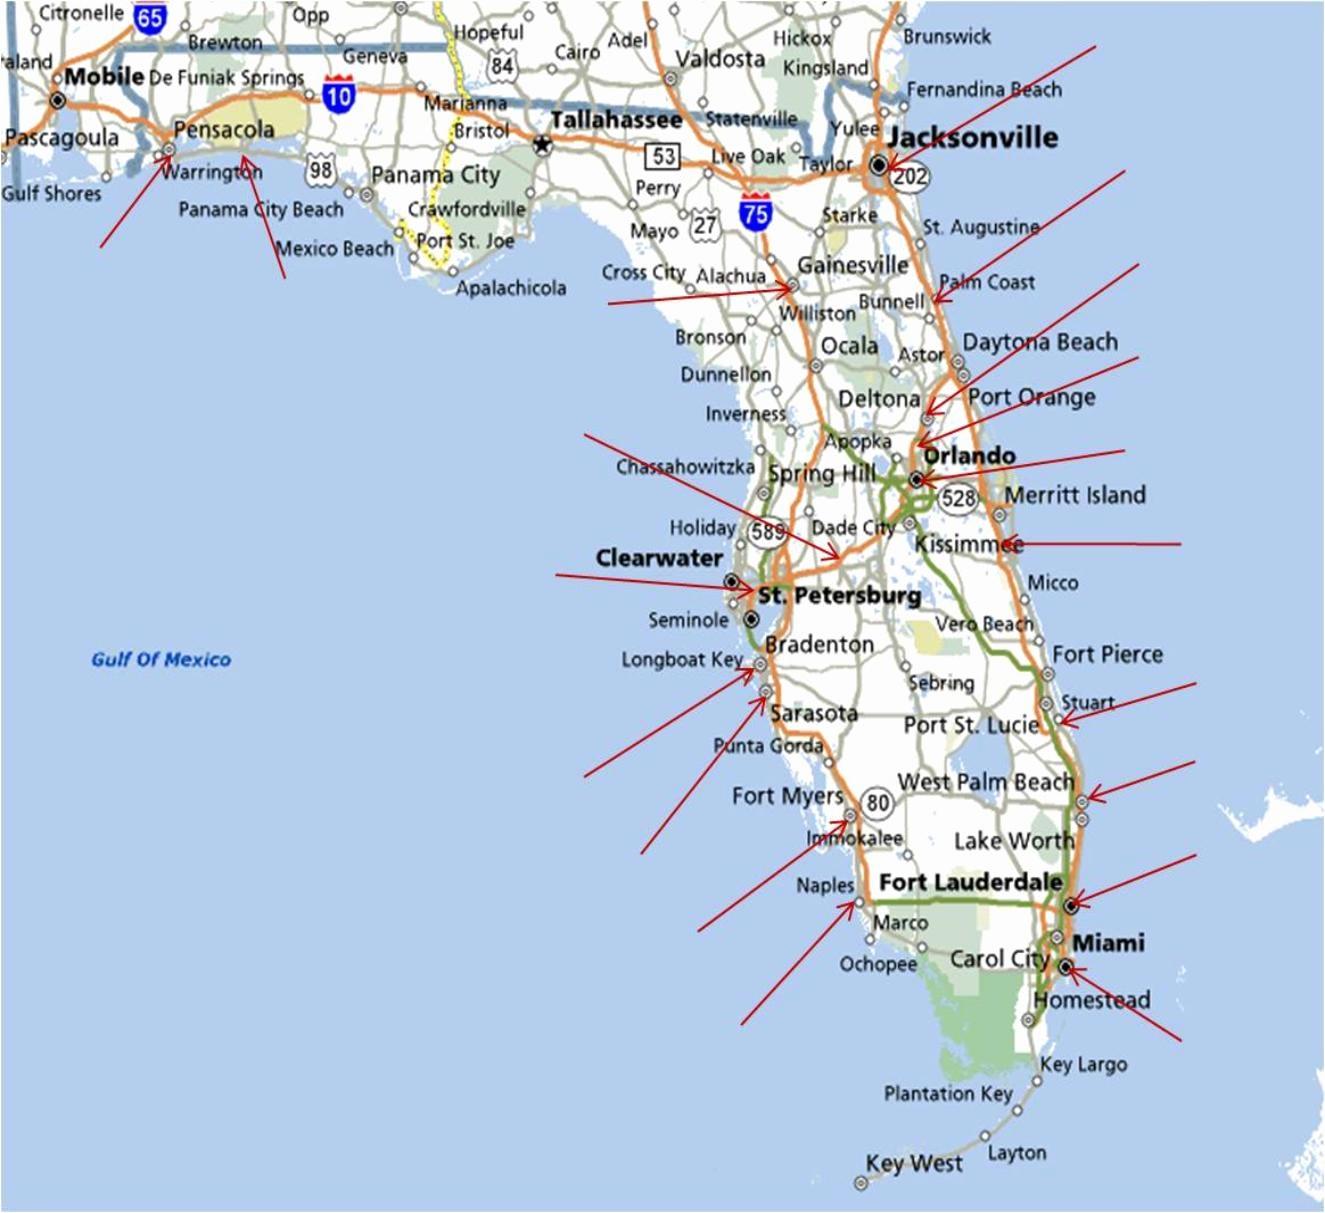 Best East Coast Florida Beaches New Map Florida West Coast Florida - Map Of Florida Gulf Coast Beach Towns